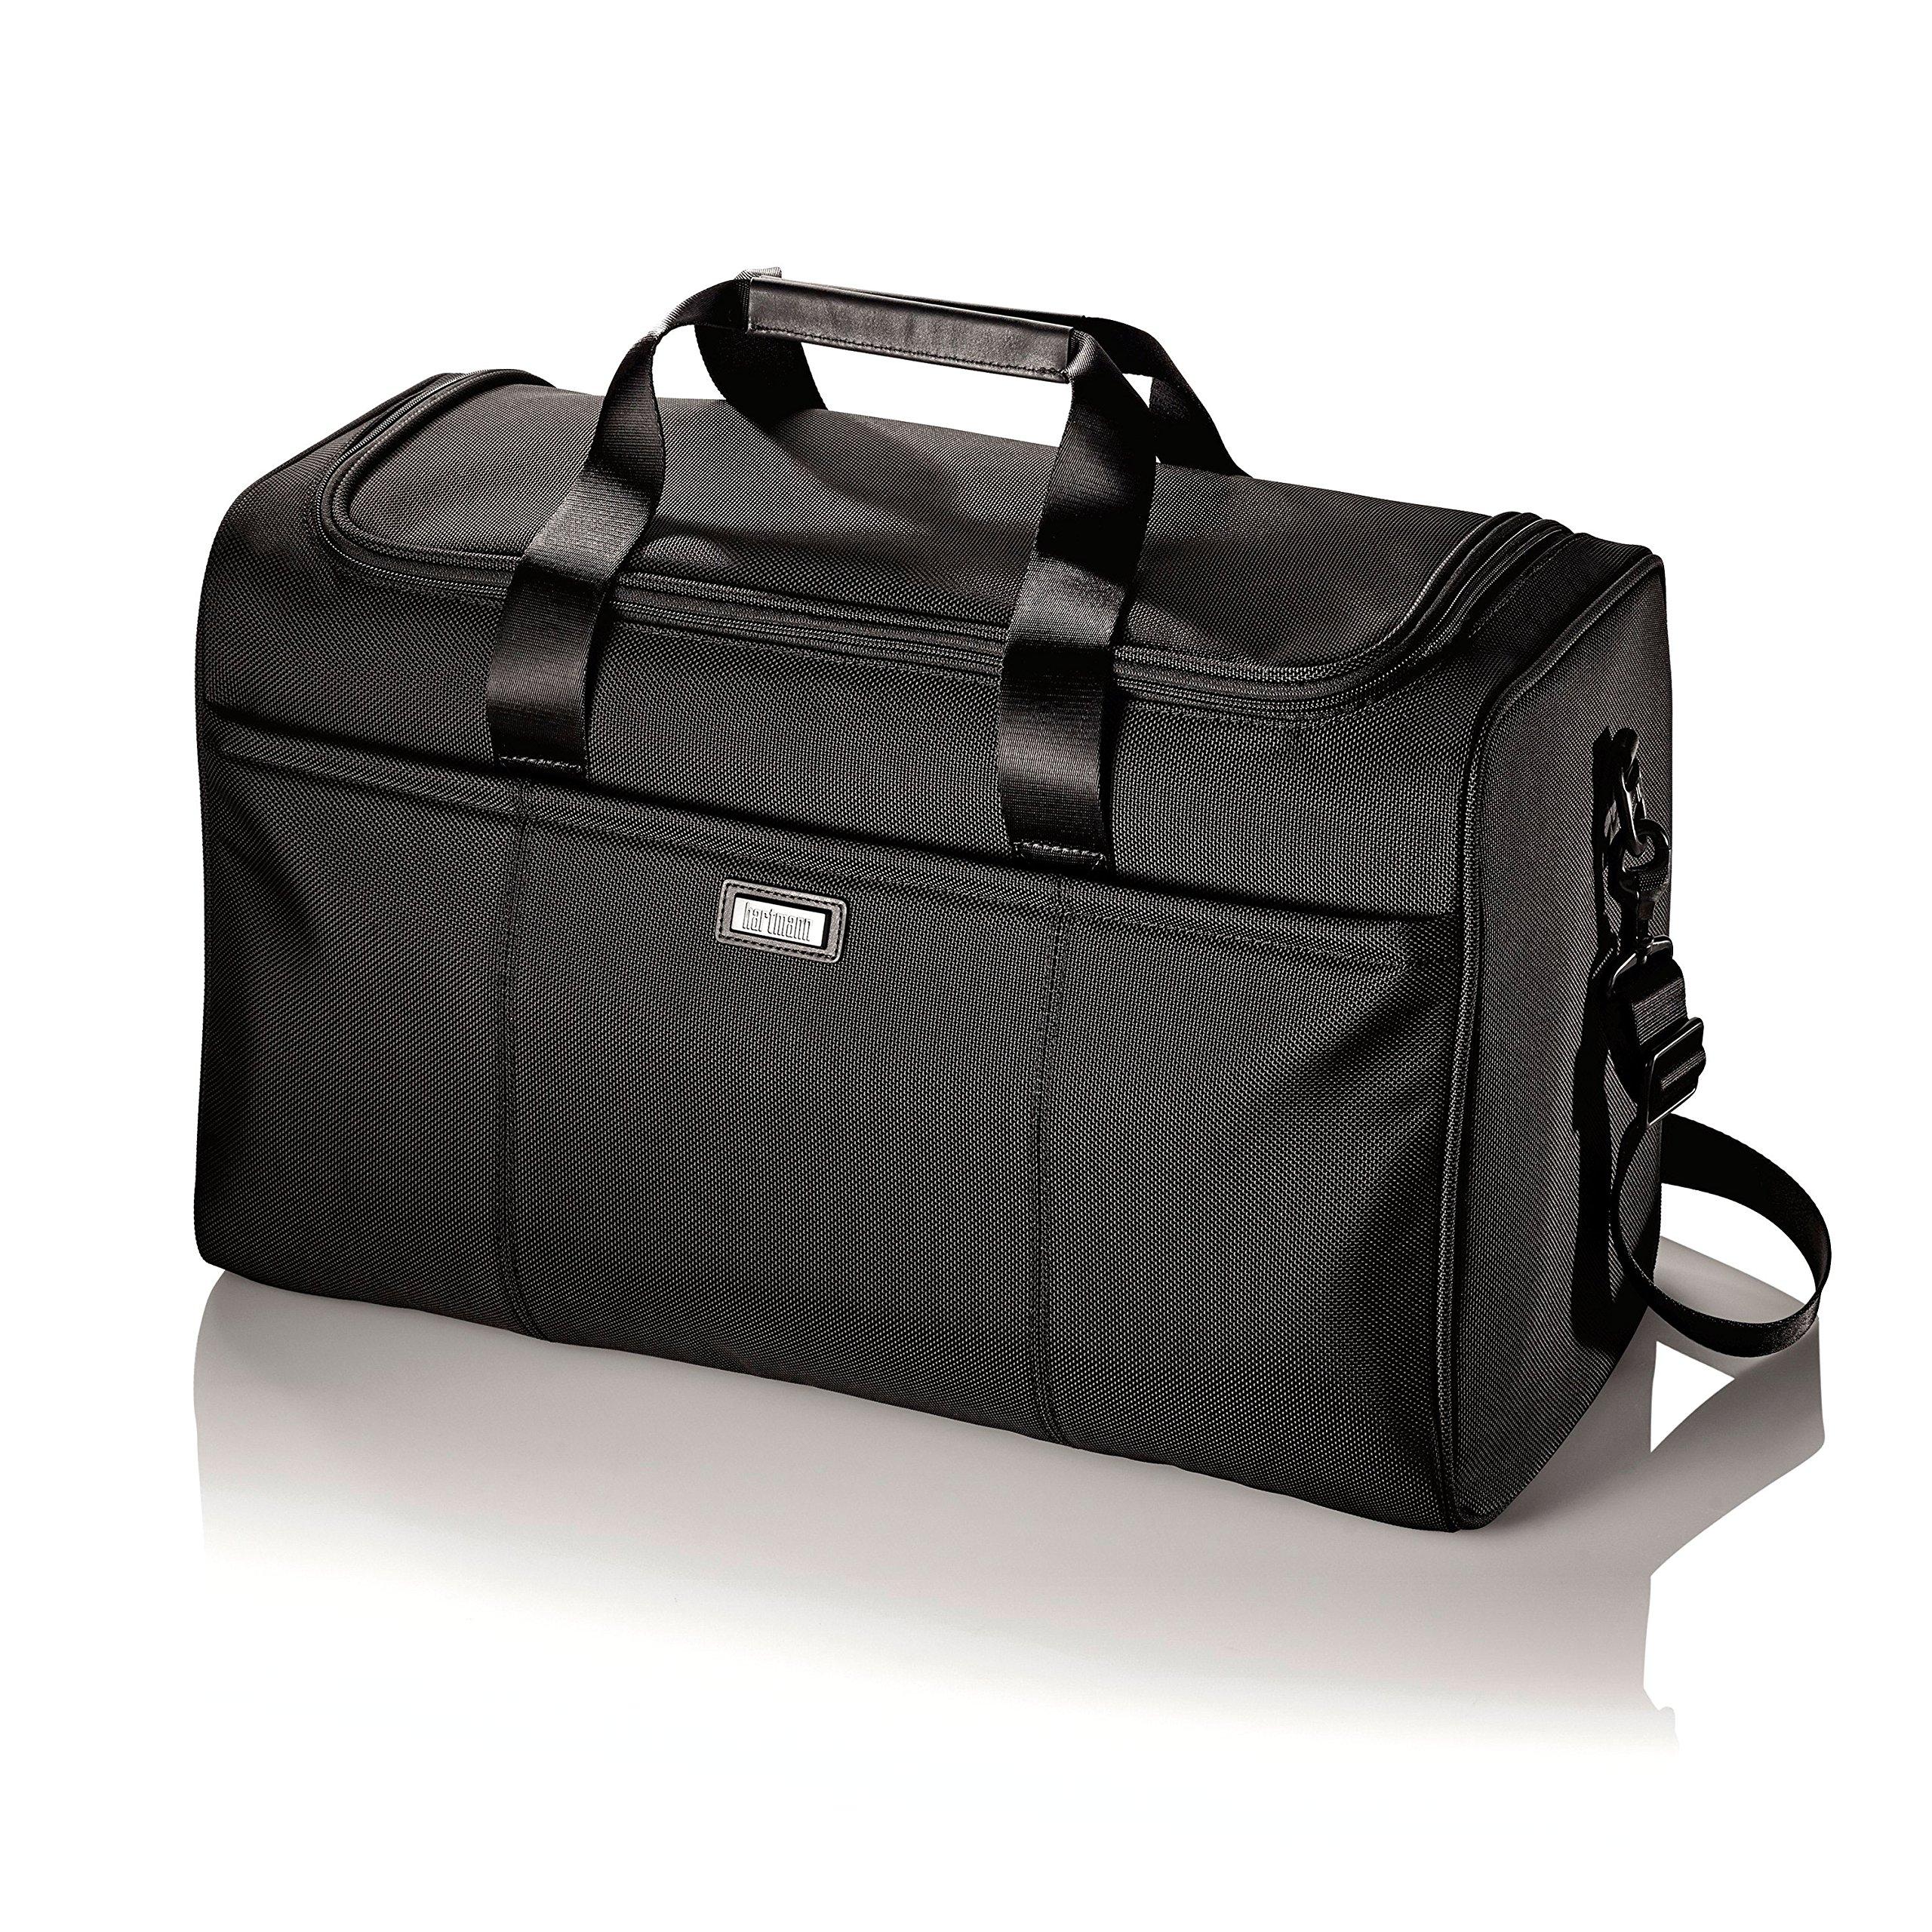 Hartmann Ratio Nylon Travel Duffel Bag in Black